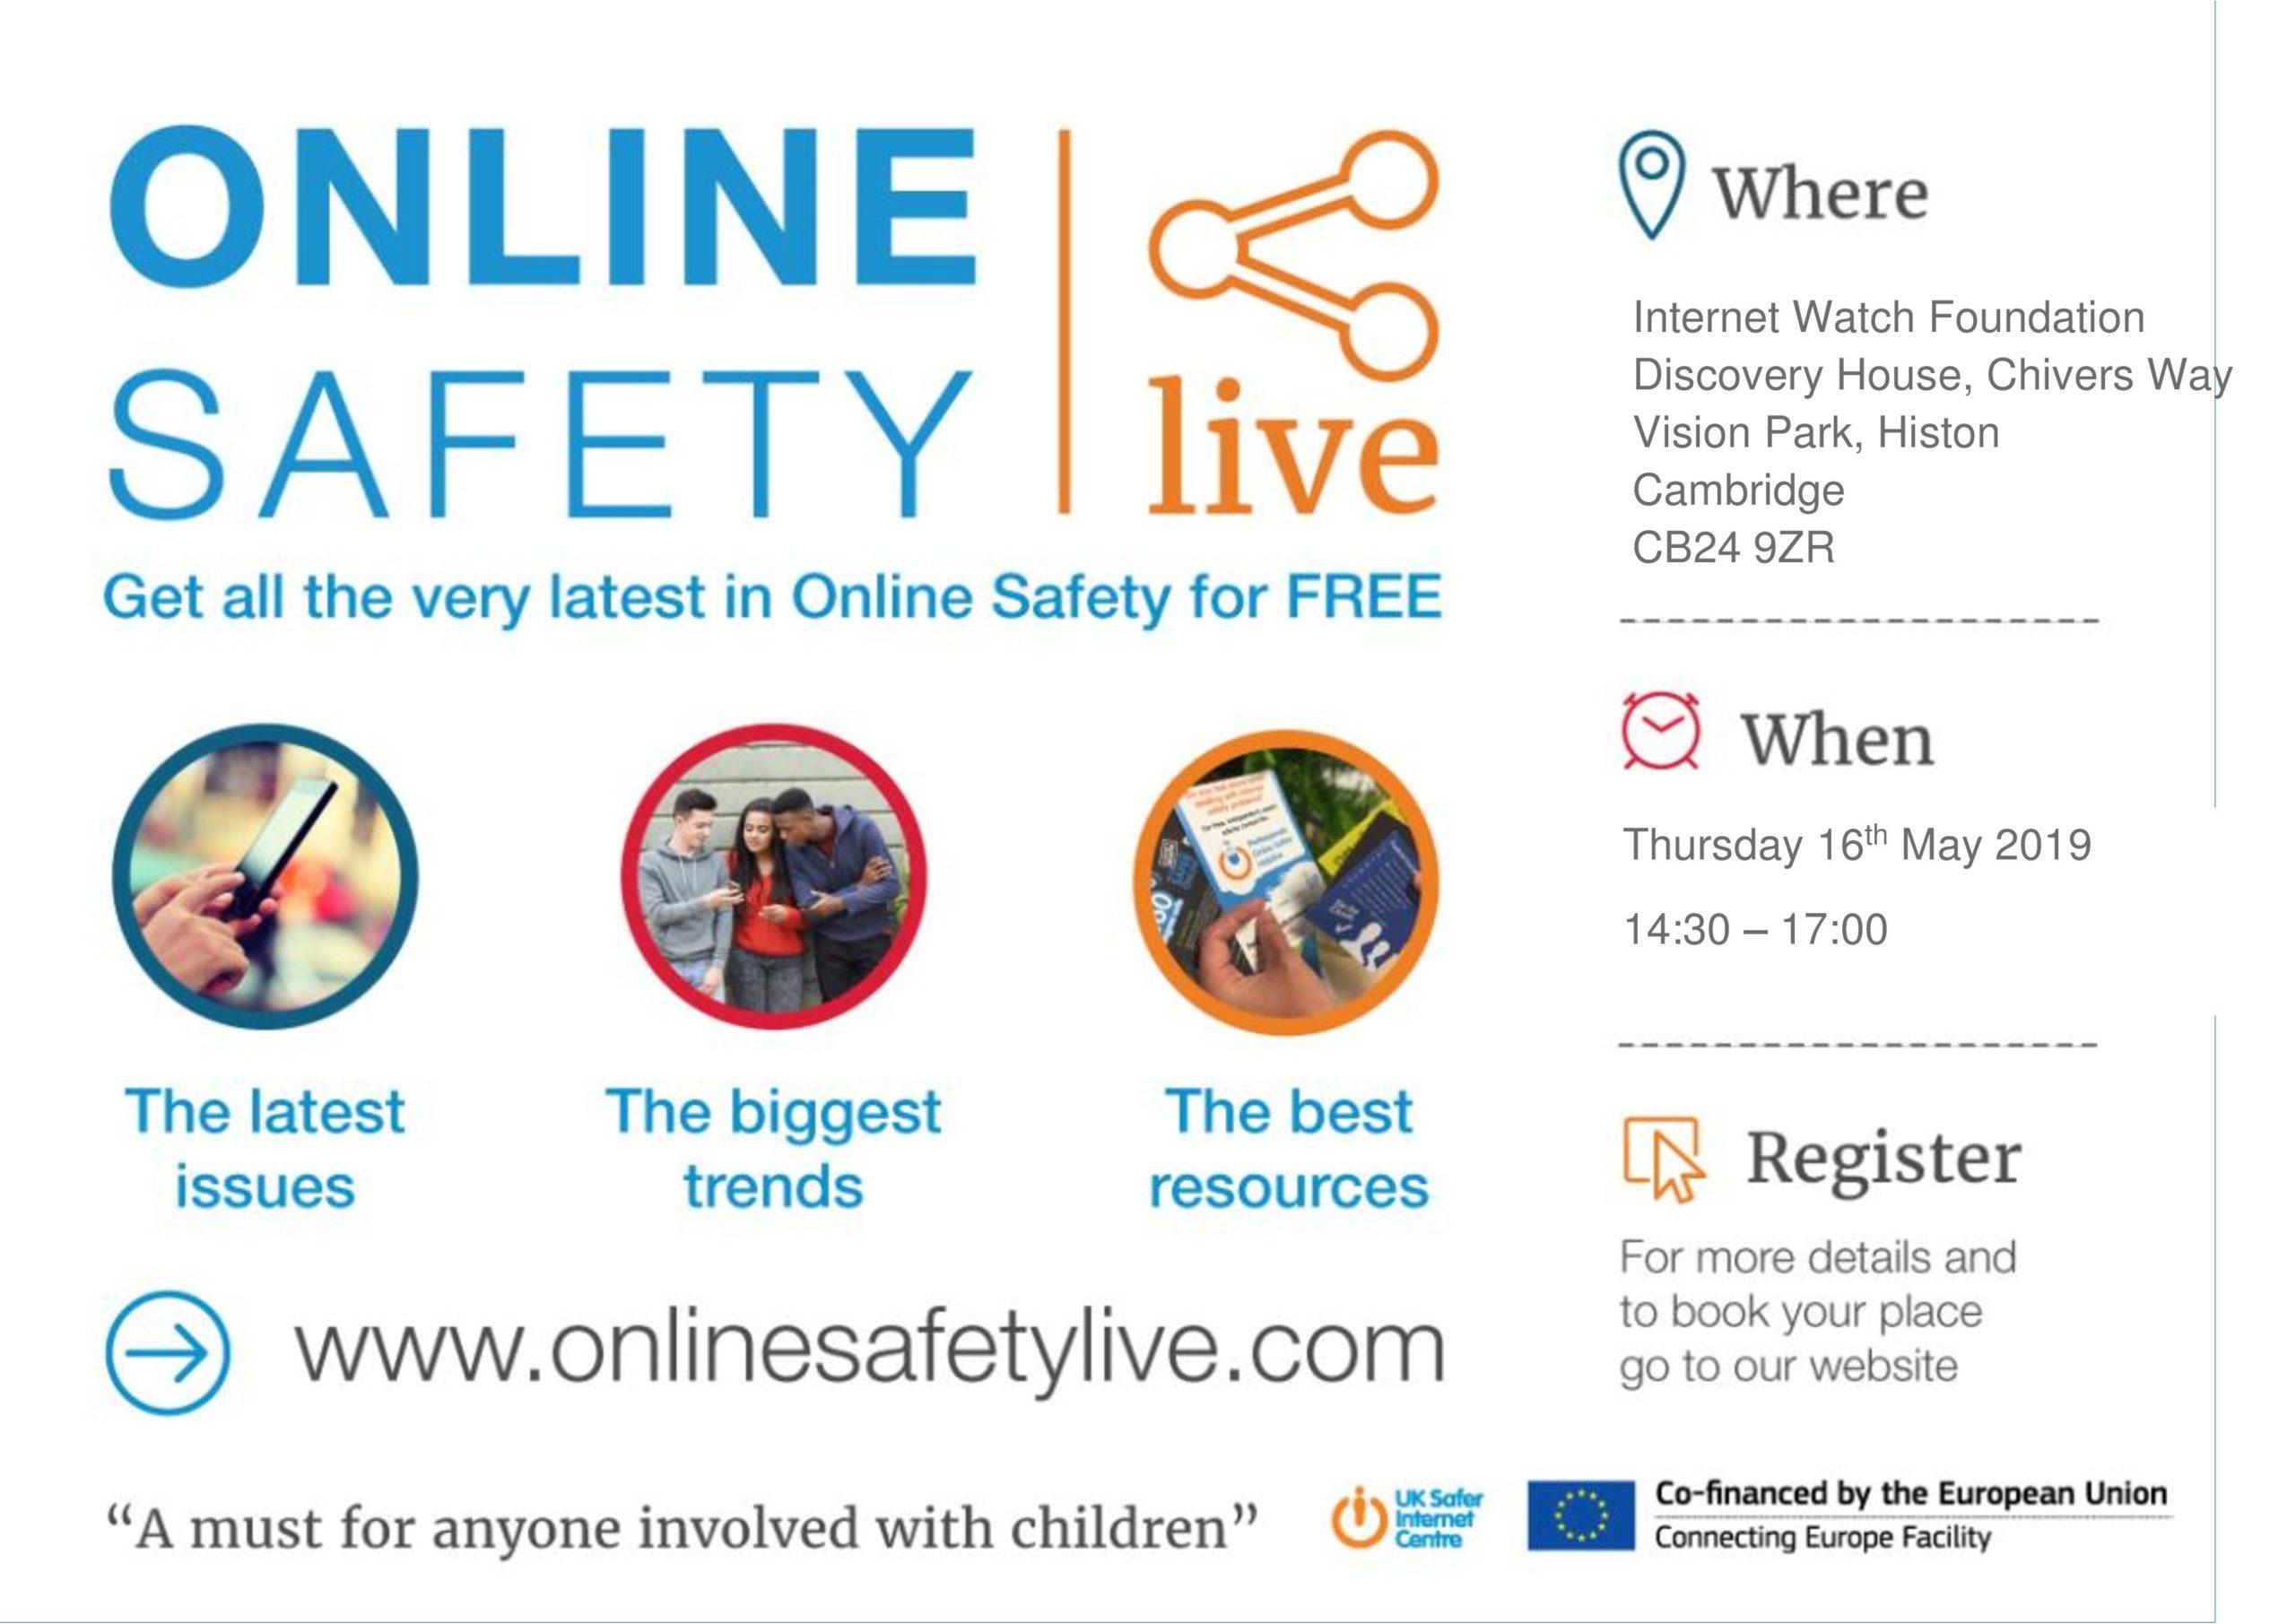 Online Safety Live